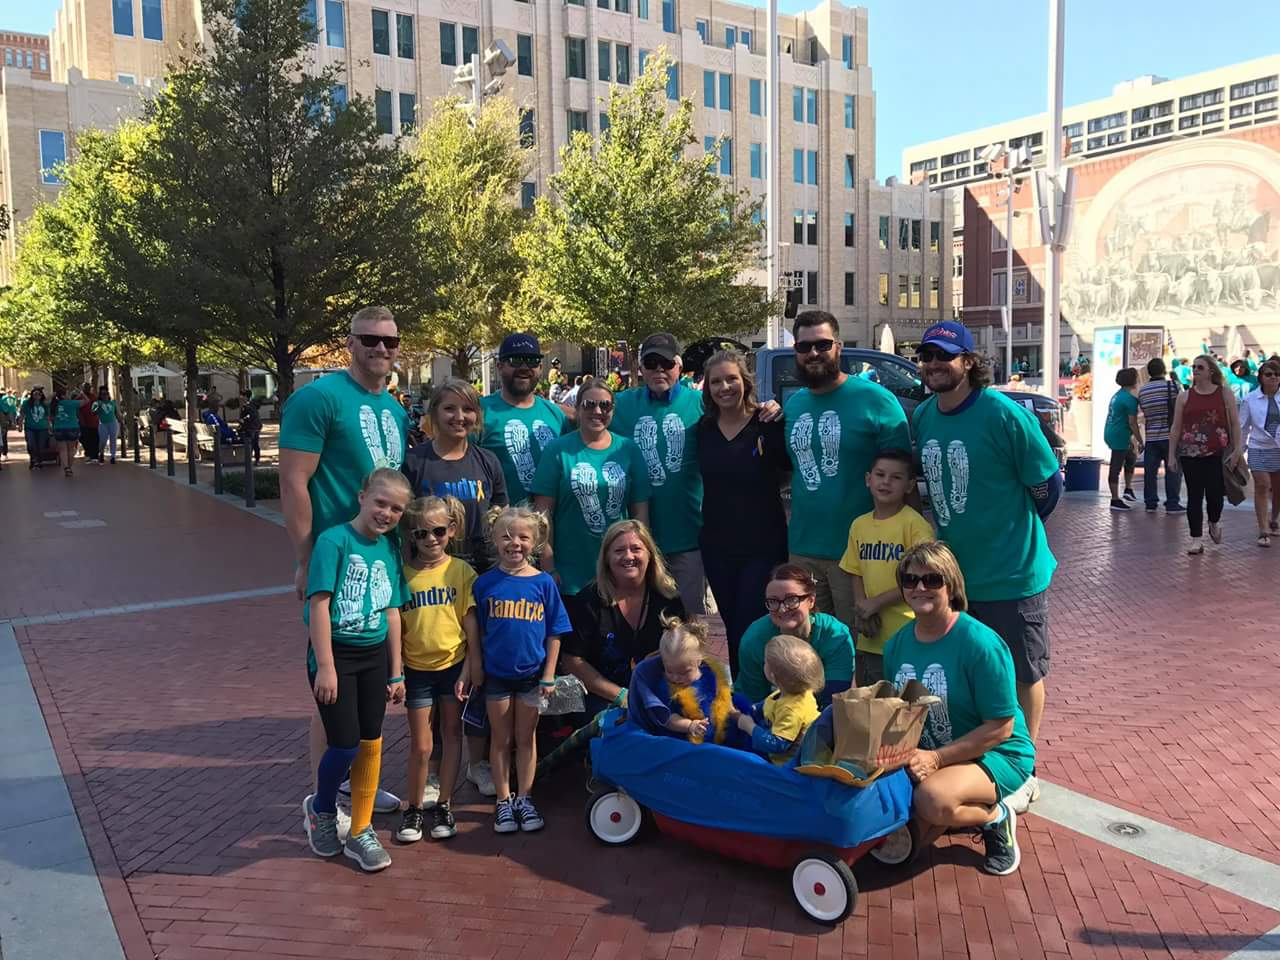 Team Landrie at the 2017 Fort Worth, Texas Buddy Walk